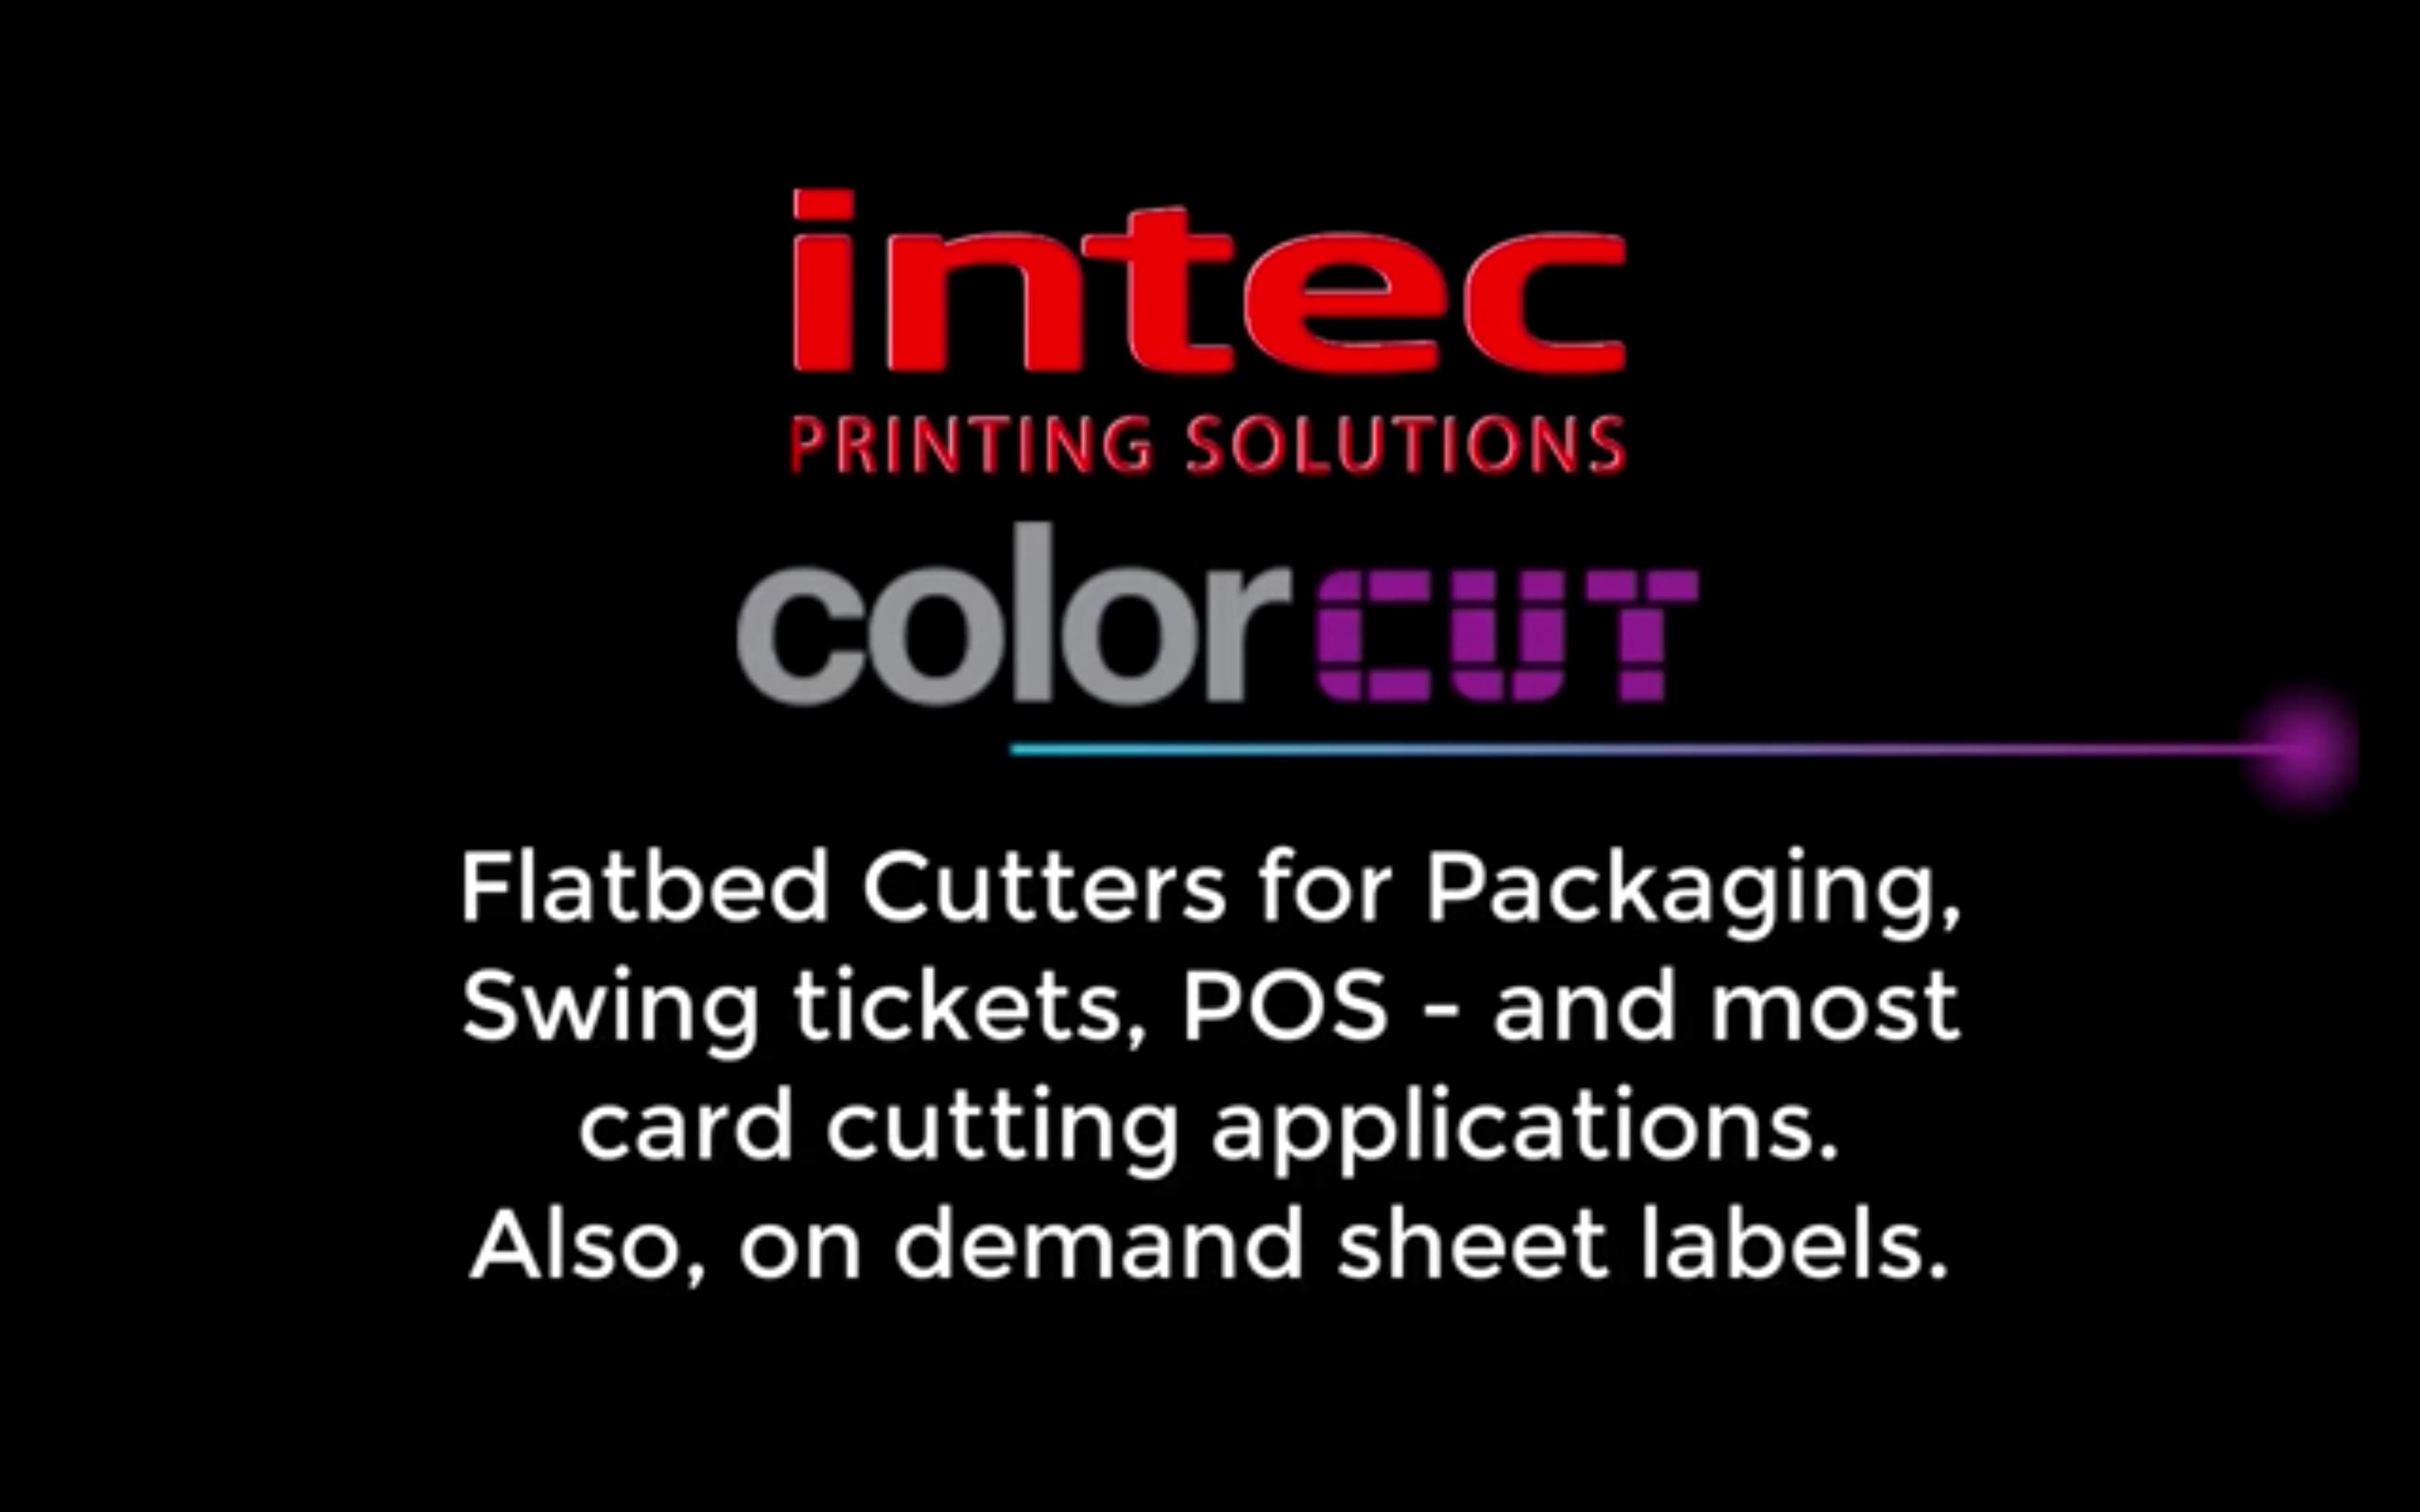 Intec ColorCut Flatbed Video